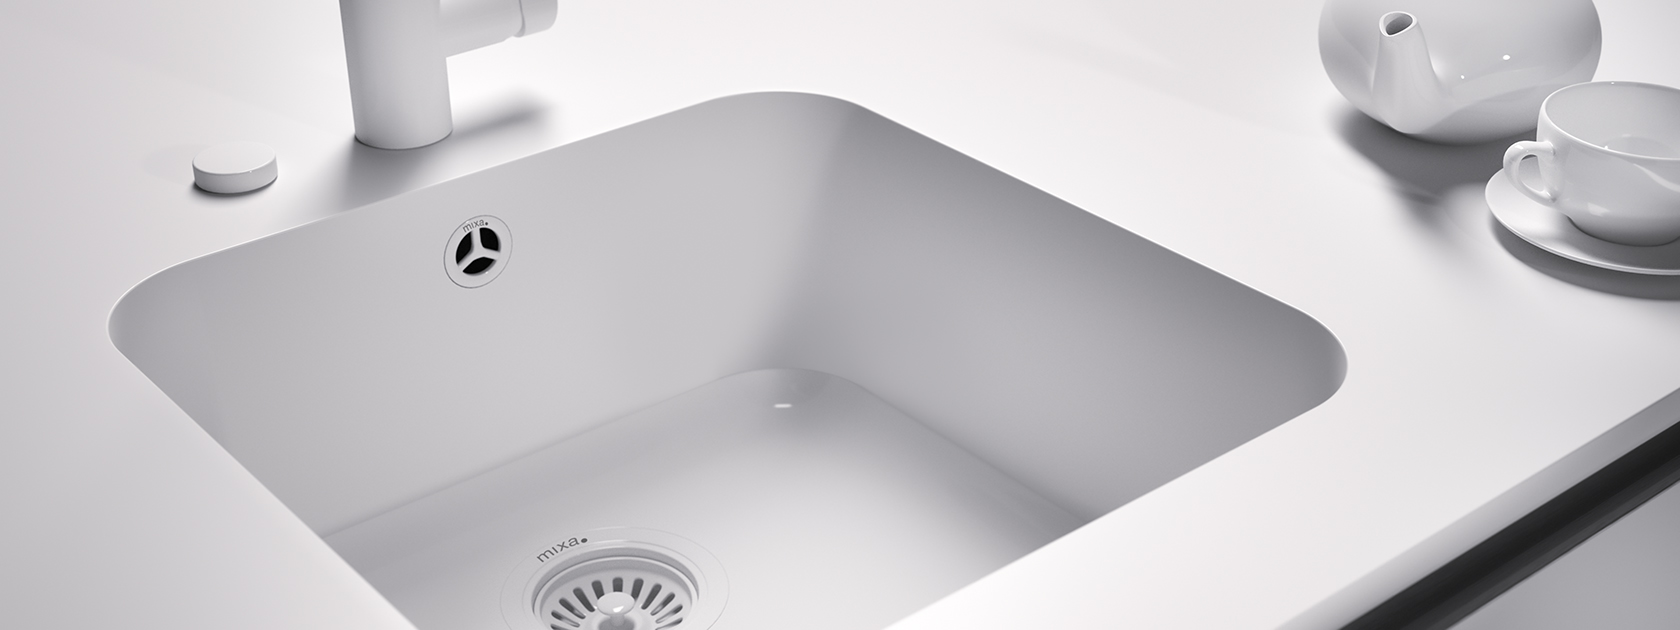 mixa r60 klassisch pfeiffer gmbh co kg. Black Bedroom Furniture Sets. Home Design Ideas